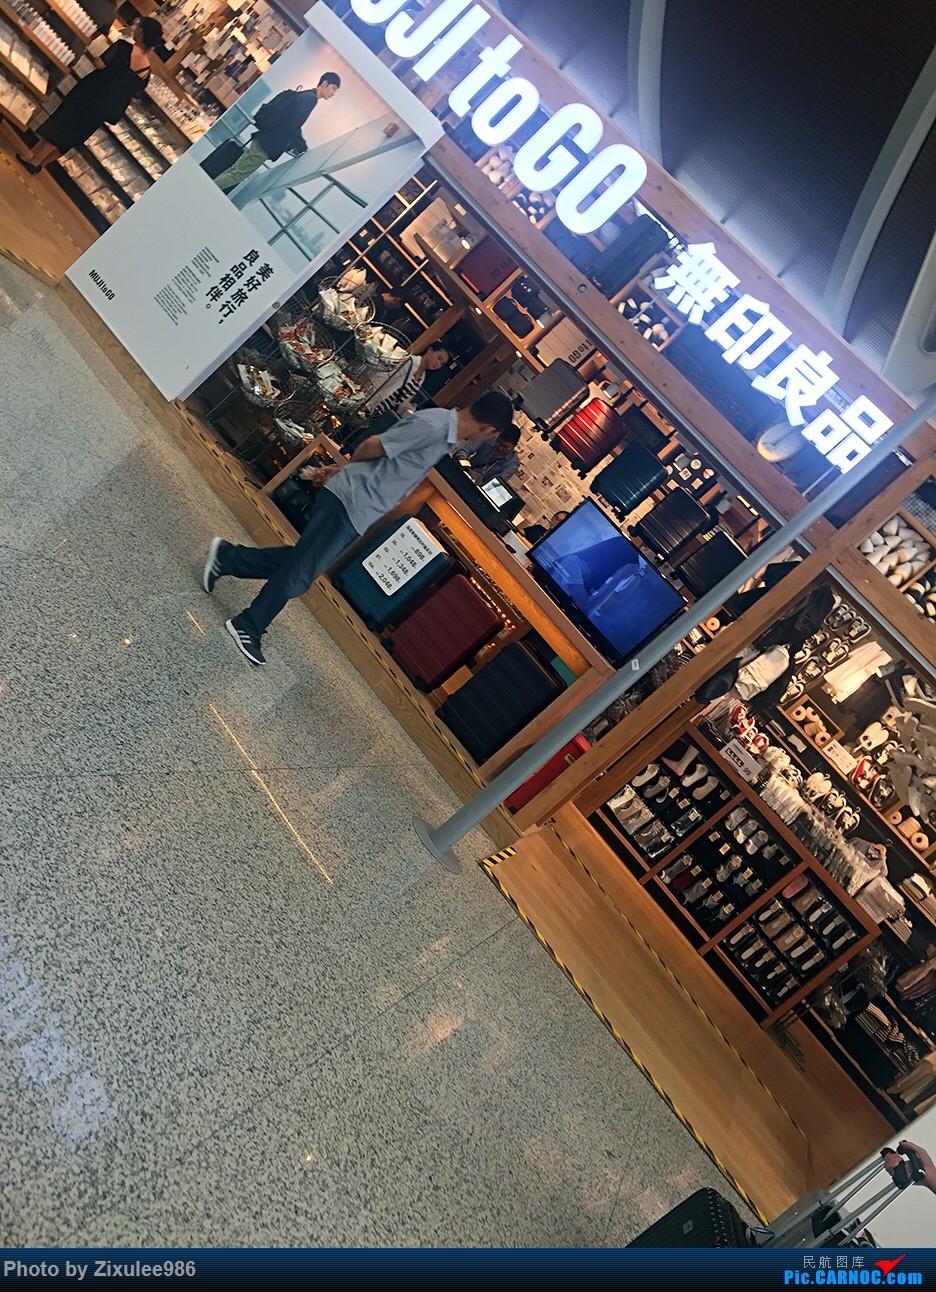 Re:[原创]加拿大21日游学之旅(一)~JJN-PVG-YYZ..(内含flightlog)~第一次发游记~多图缓更请谅解 AIRBUS A320-200  中国上海浦东国际机场 中国上海浦东国际机场